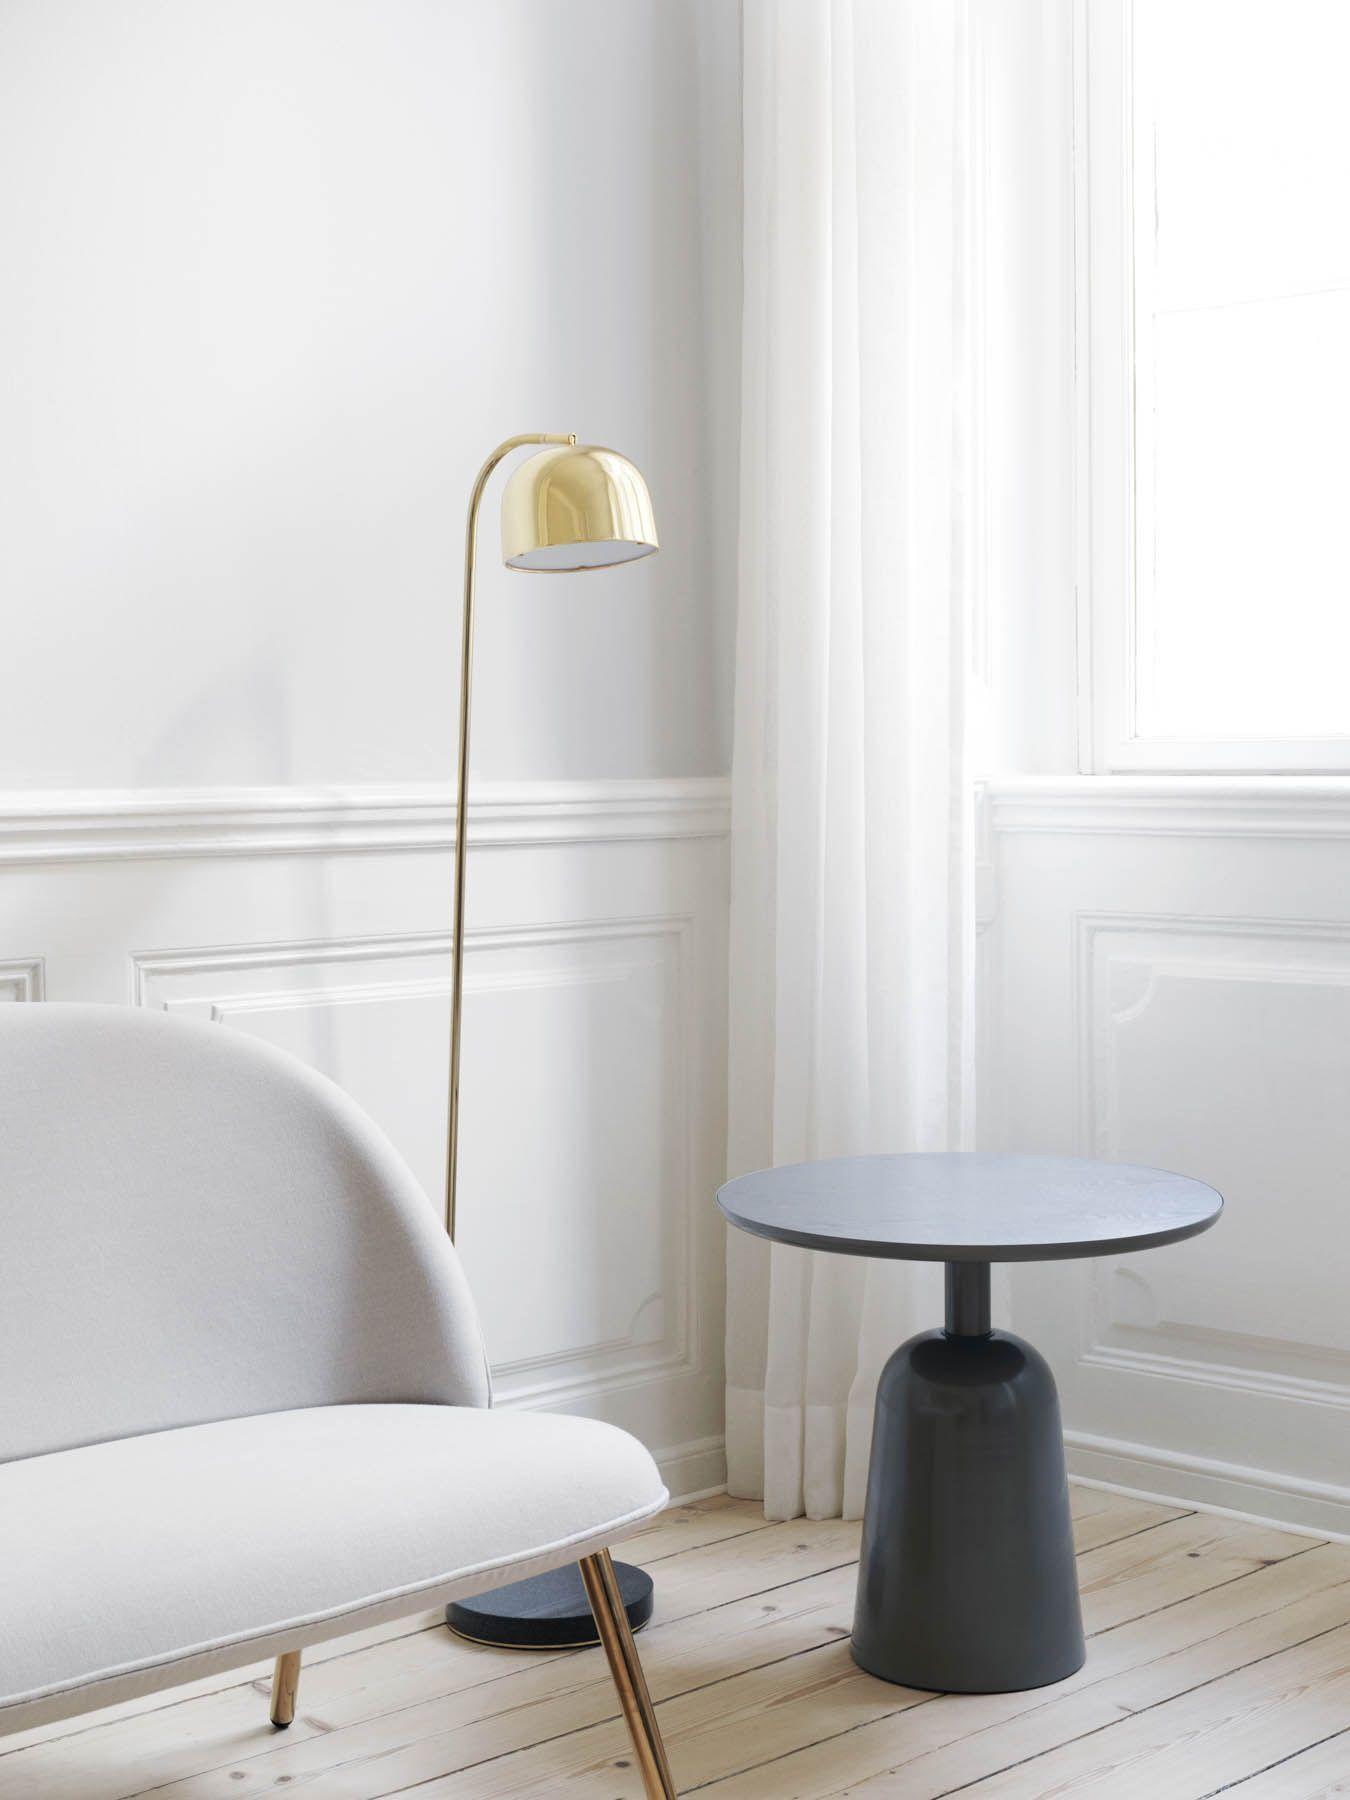 Pin On Design In Scandinavia